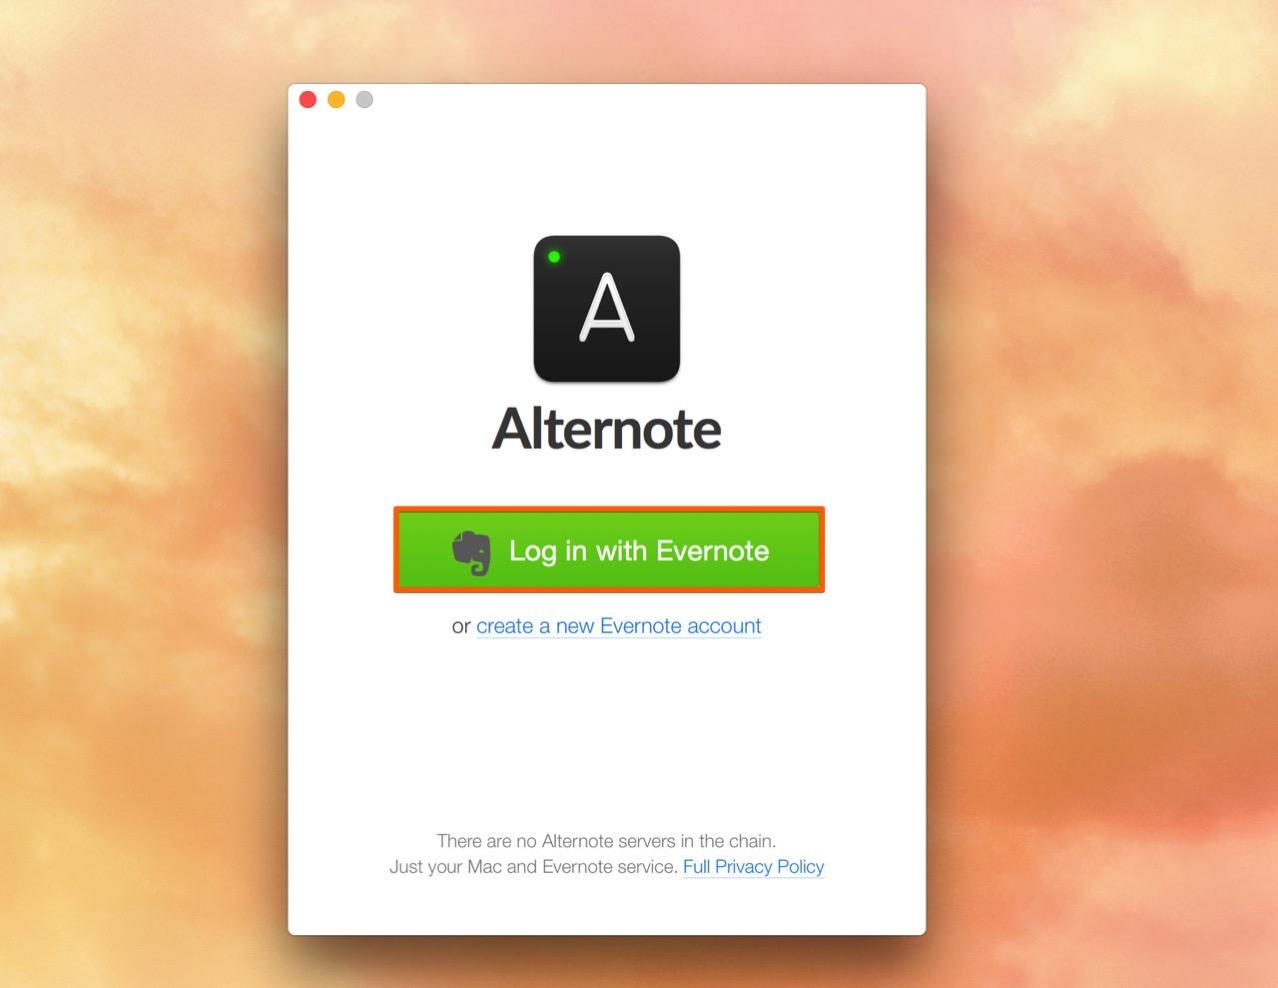 Alternote3